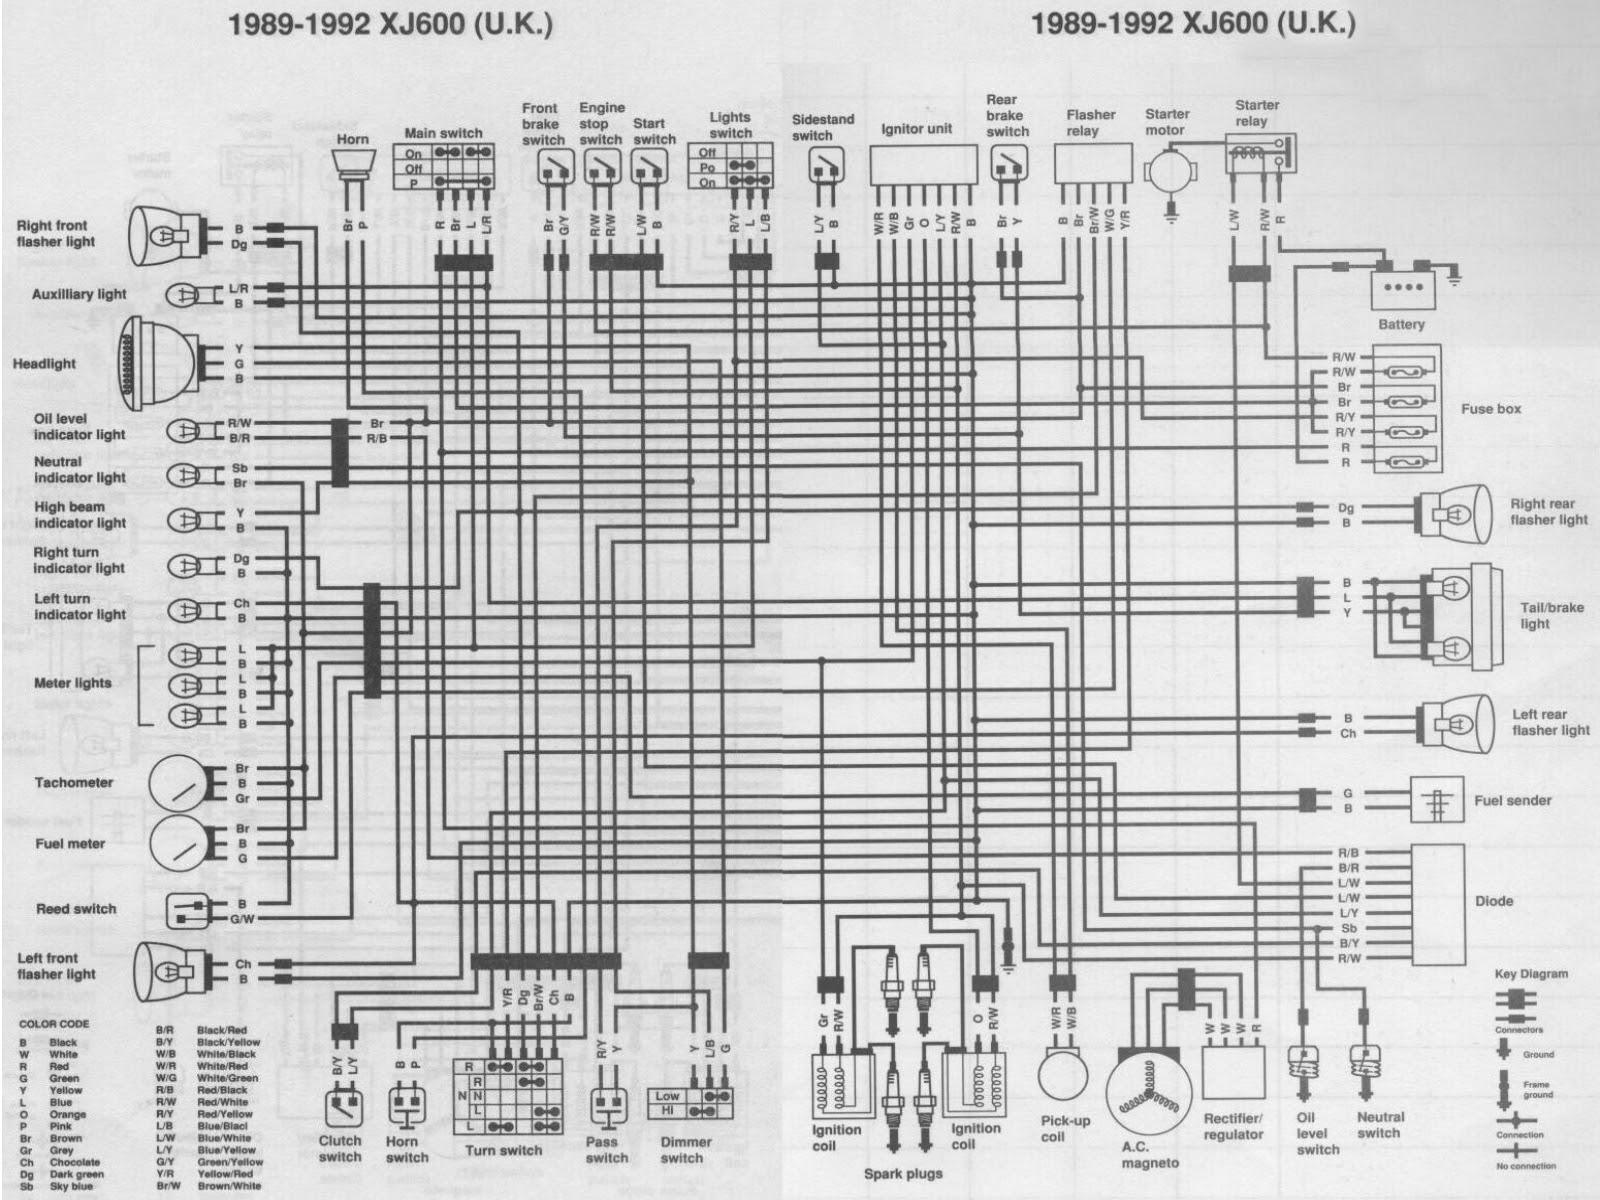 Diagram 83 Yamaha Seca 750 Wiring Diagram Full Version Hd Quality Wiring Diagram Blogxgoo Mefpie Fr